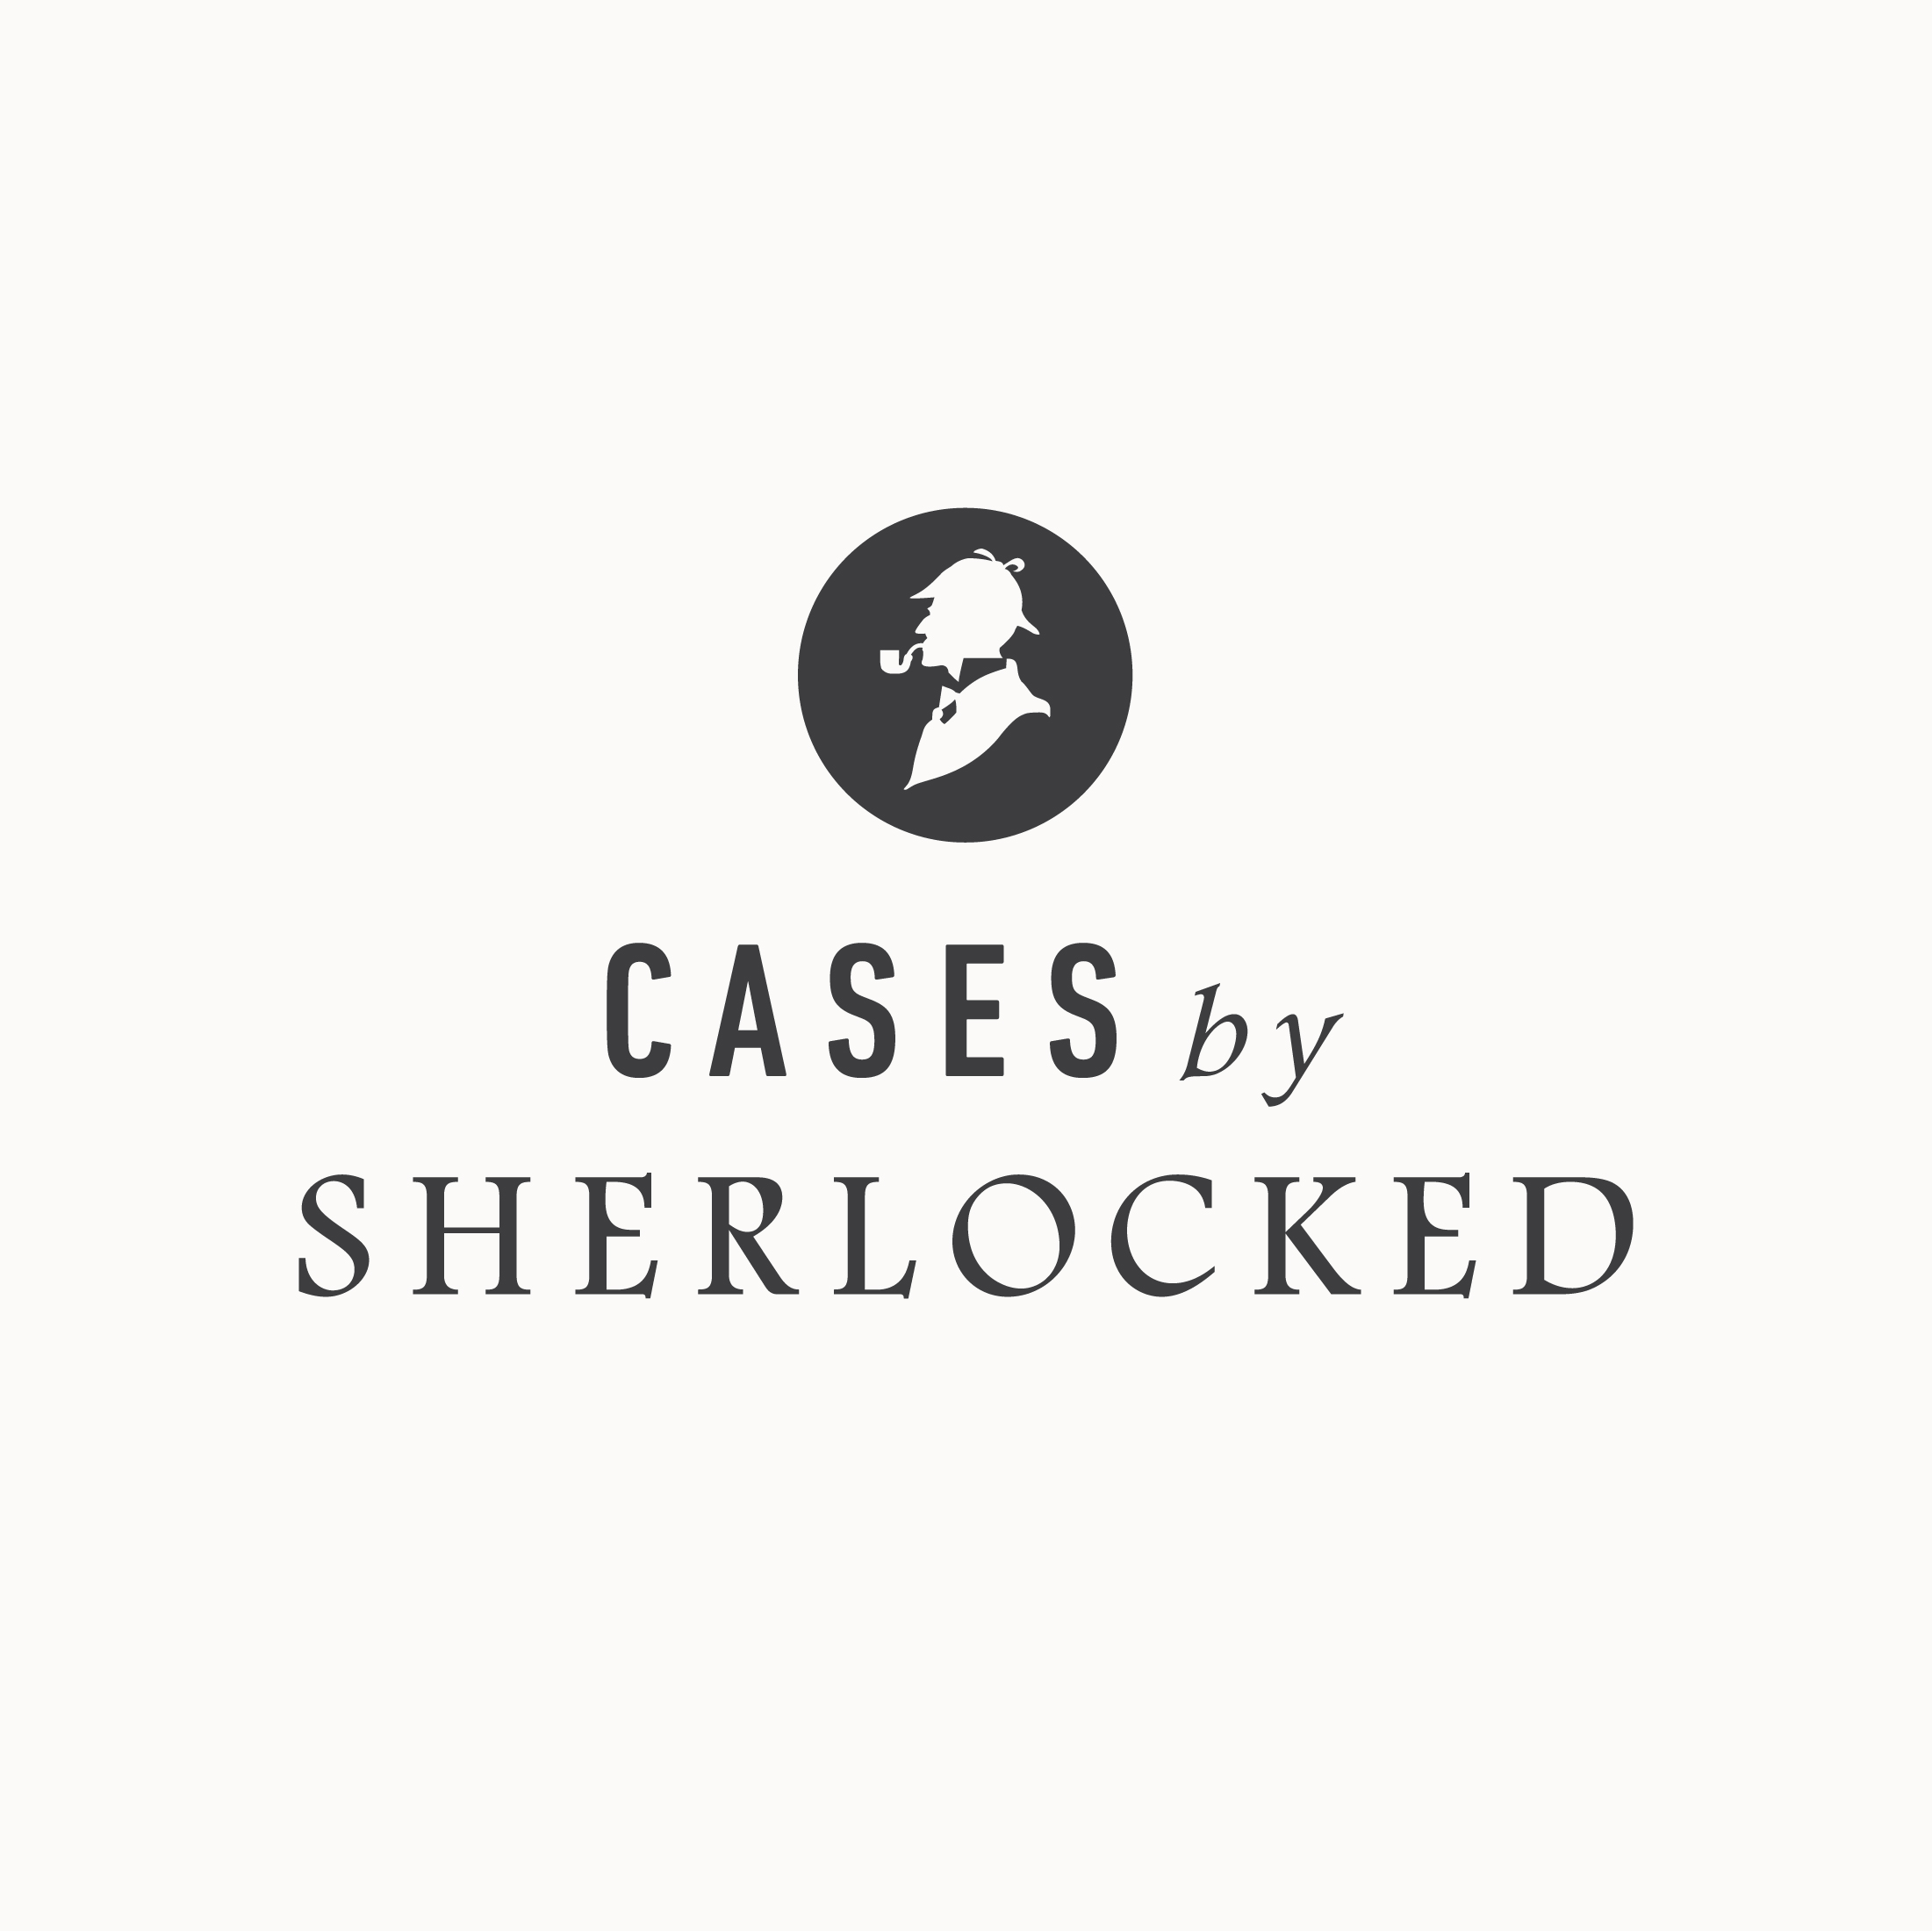 Cases by Sherlocked